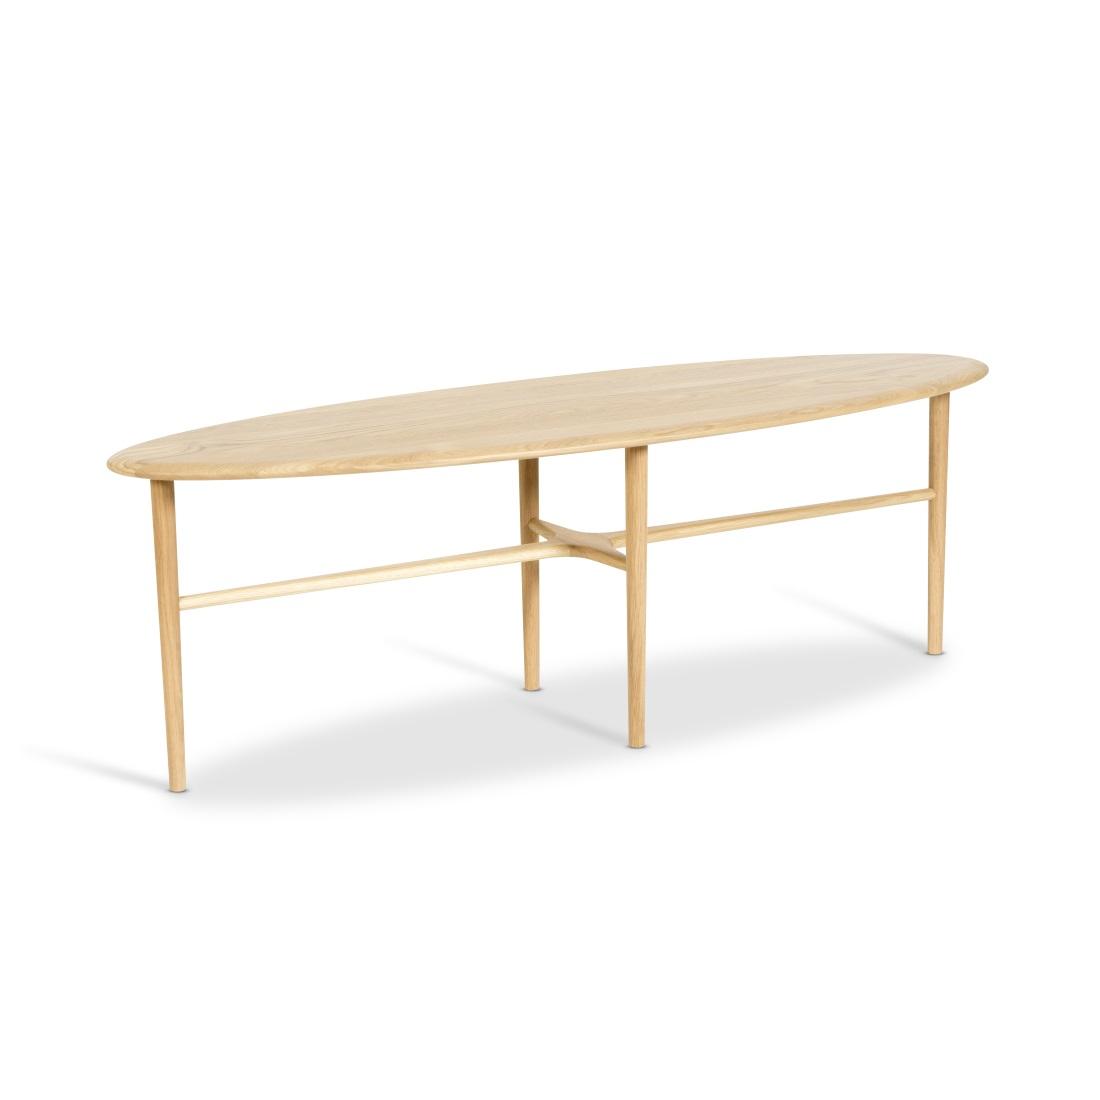 CREST avlångt bord ljus ek Mavis